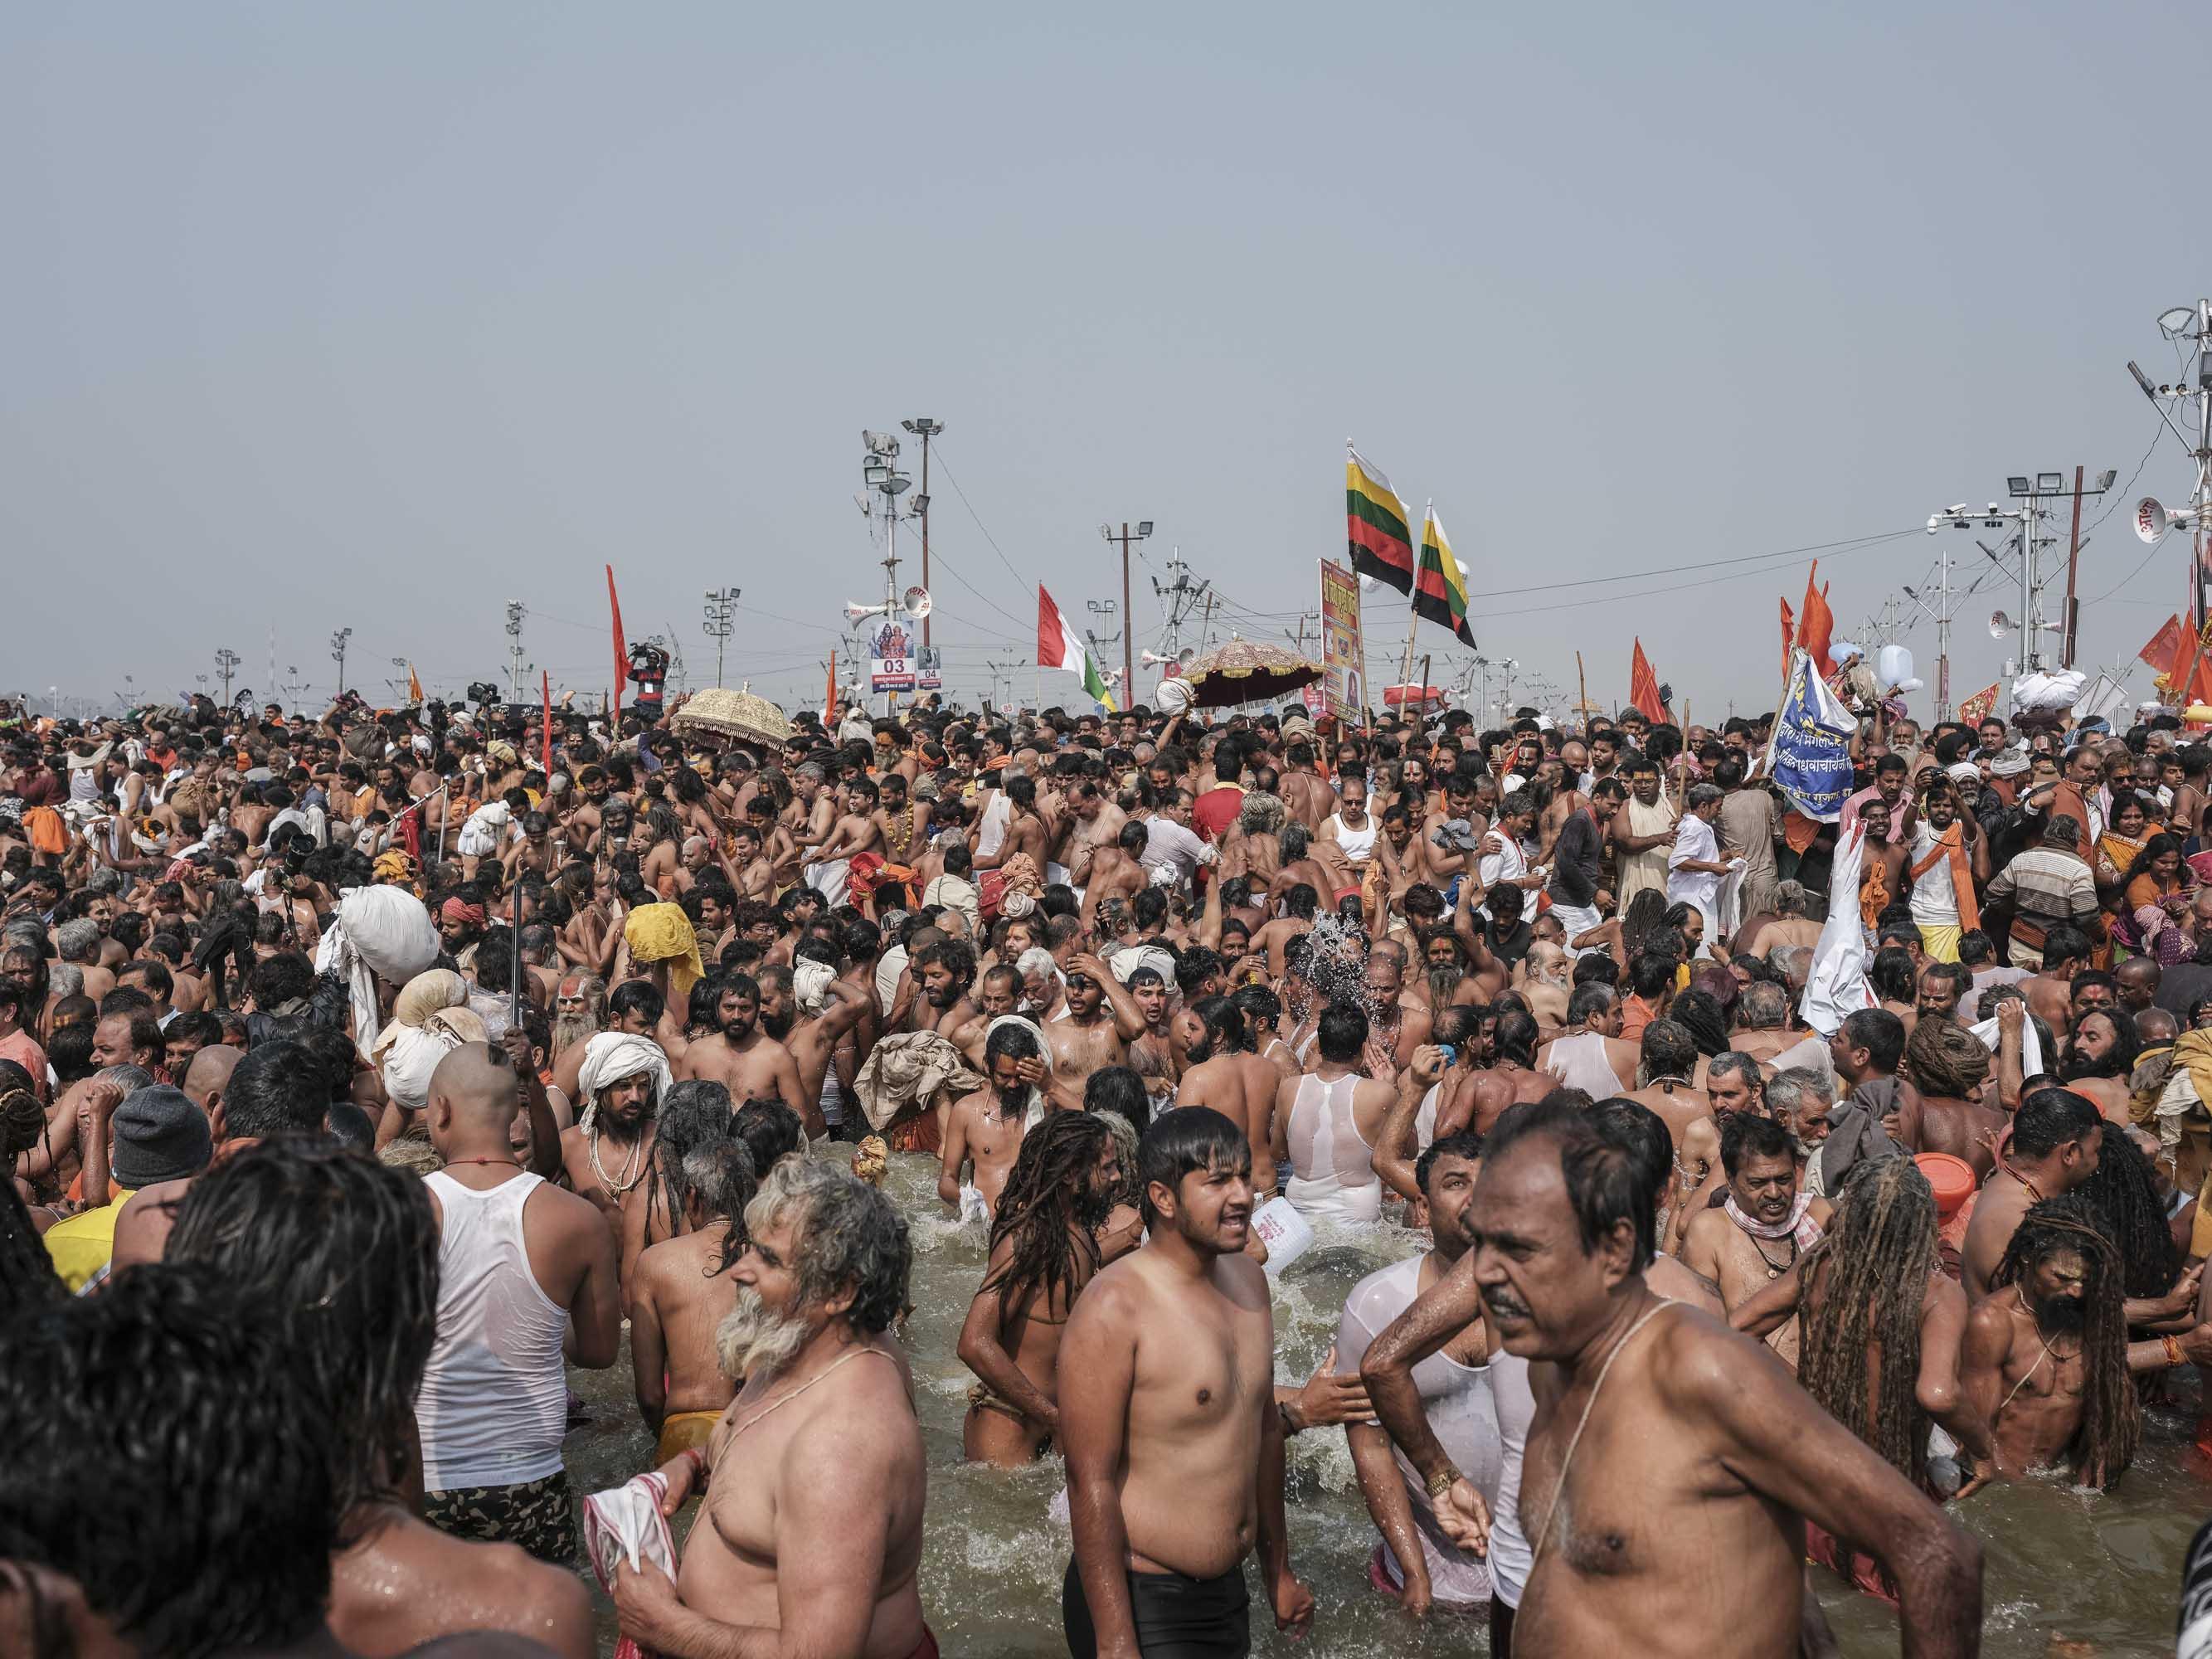 crowd people flag men pilgrims Kumbh mela 2019 India Allahabad Prayagraj Ardh hindu religious Festival event rivers photographer jose jeuland photography